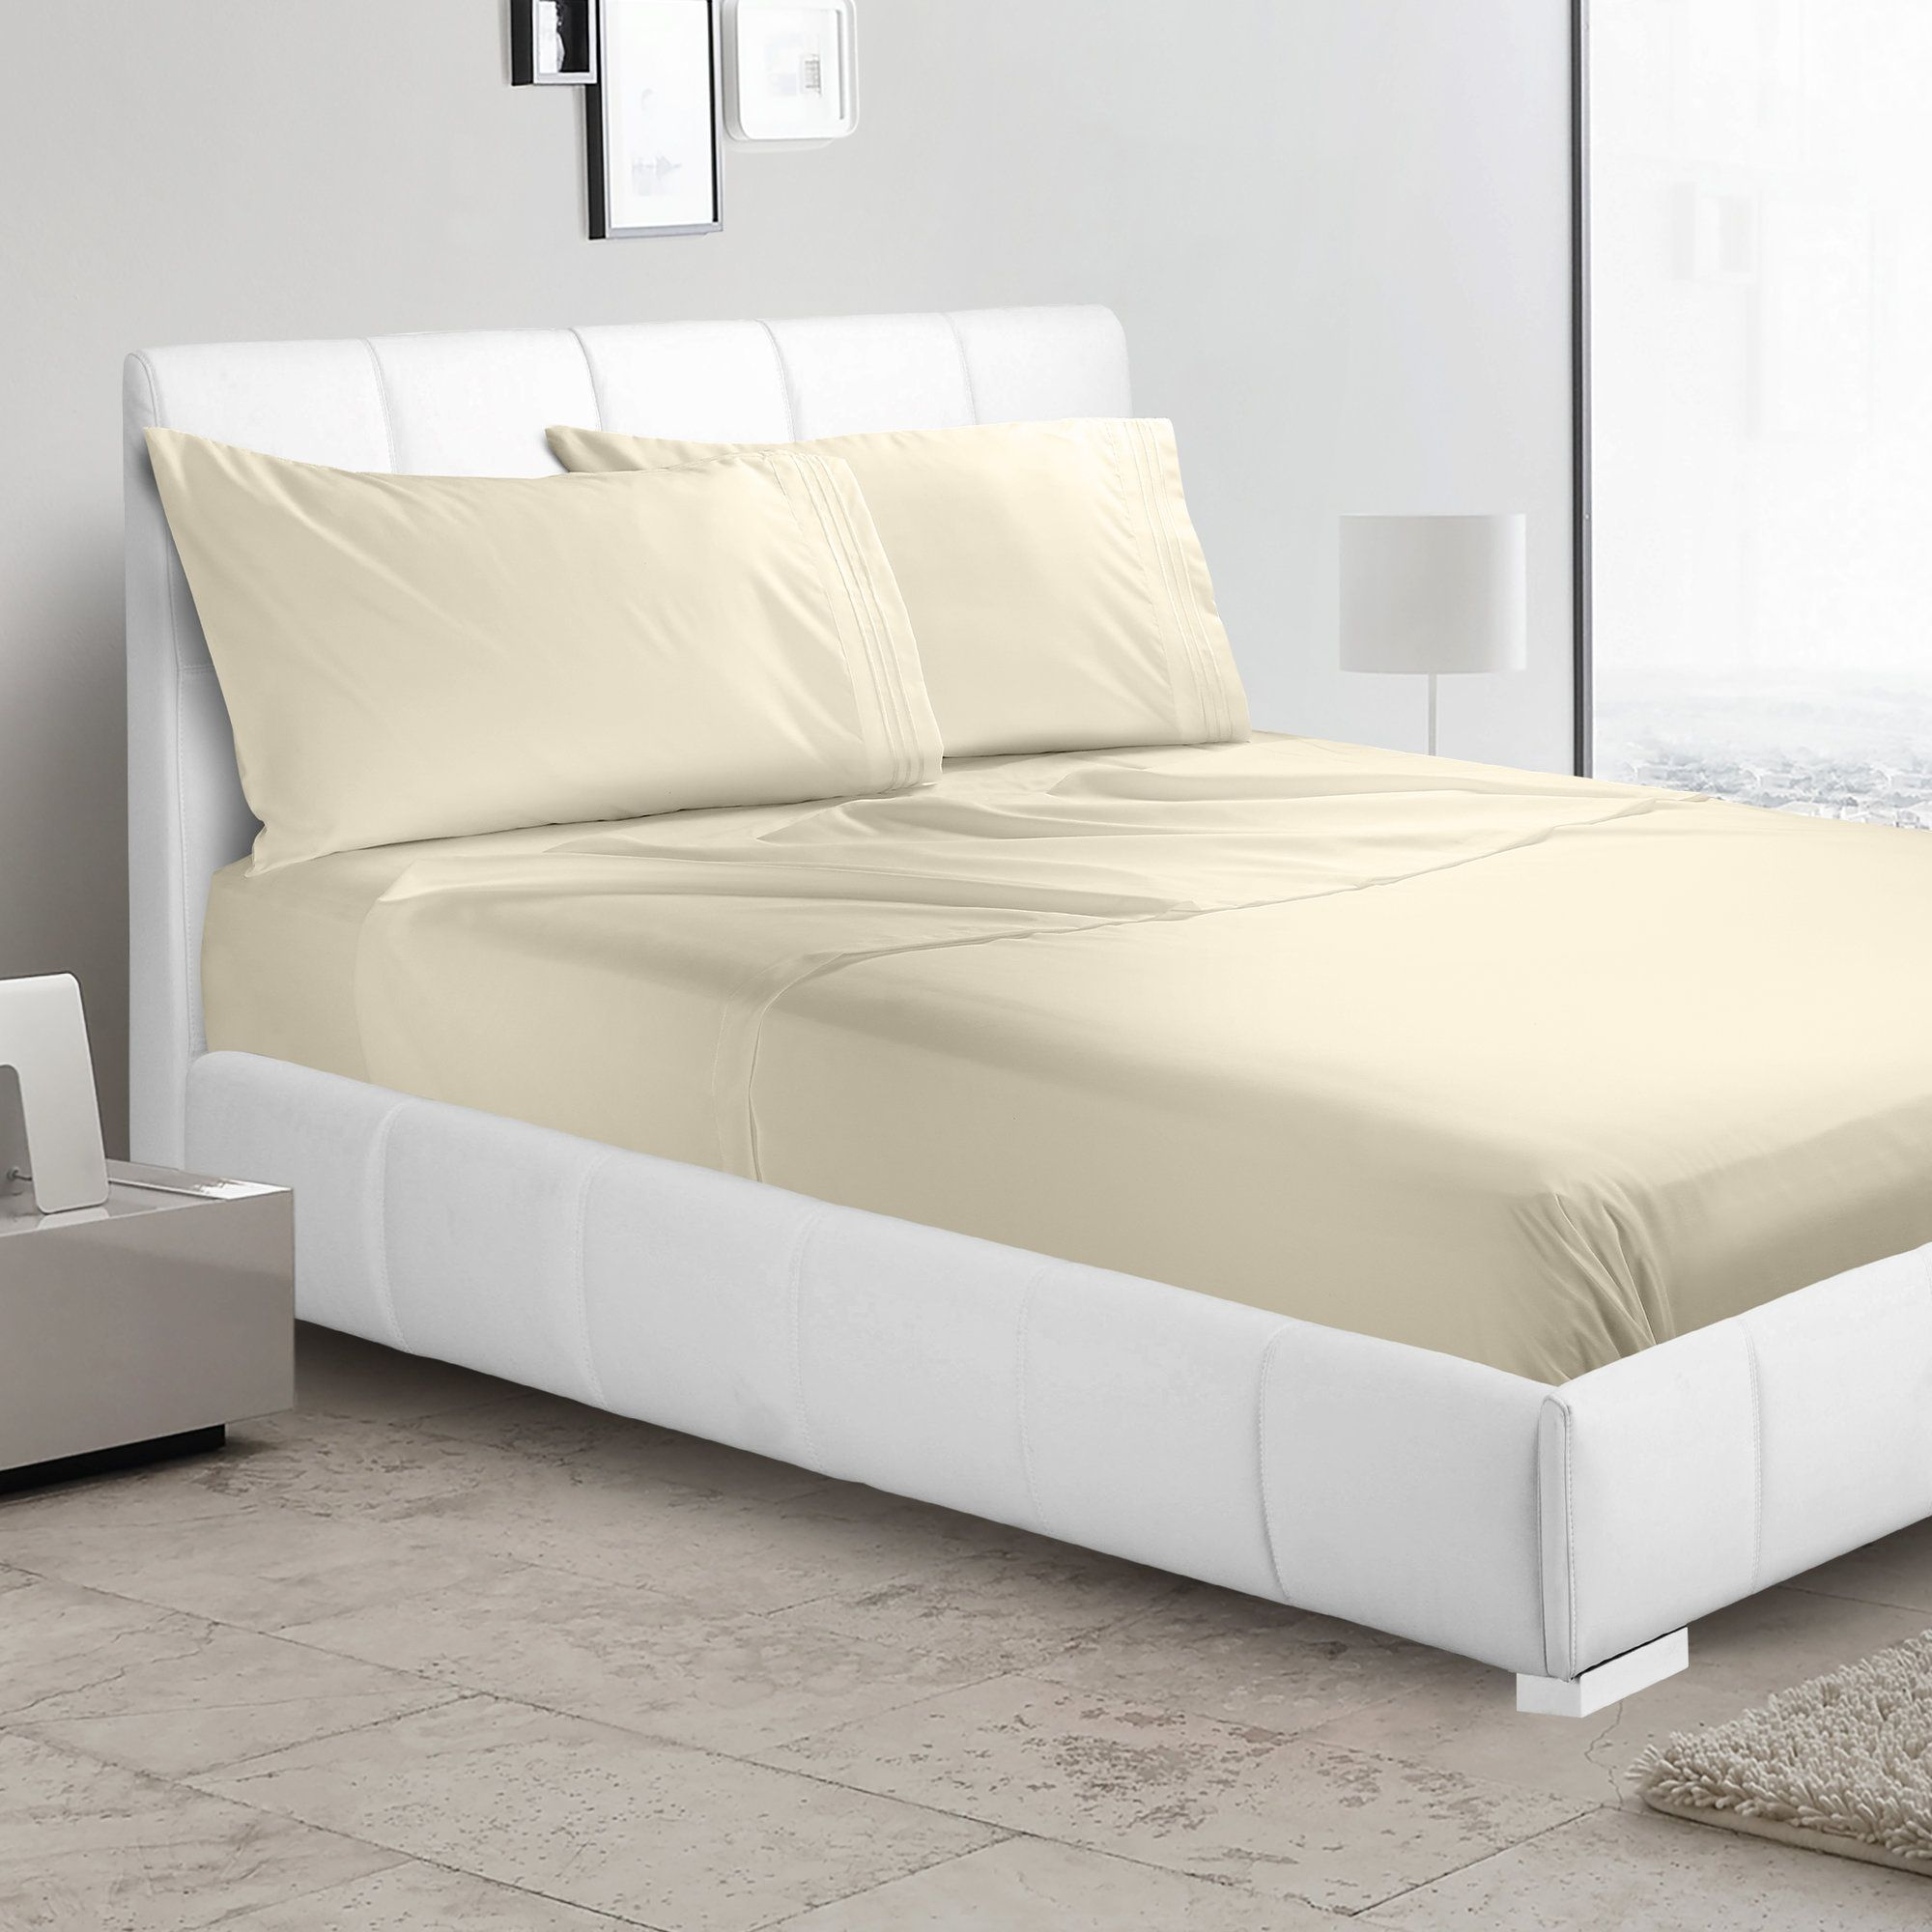 Verna Flat Sheet Flat sheets, Cheap bed sheets, Flat